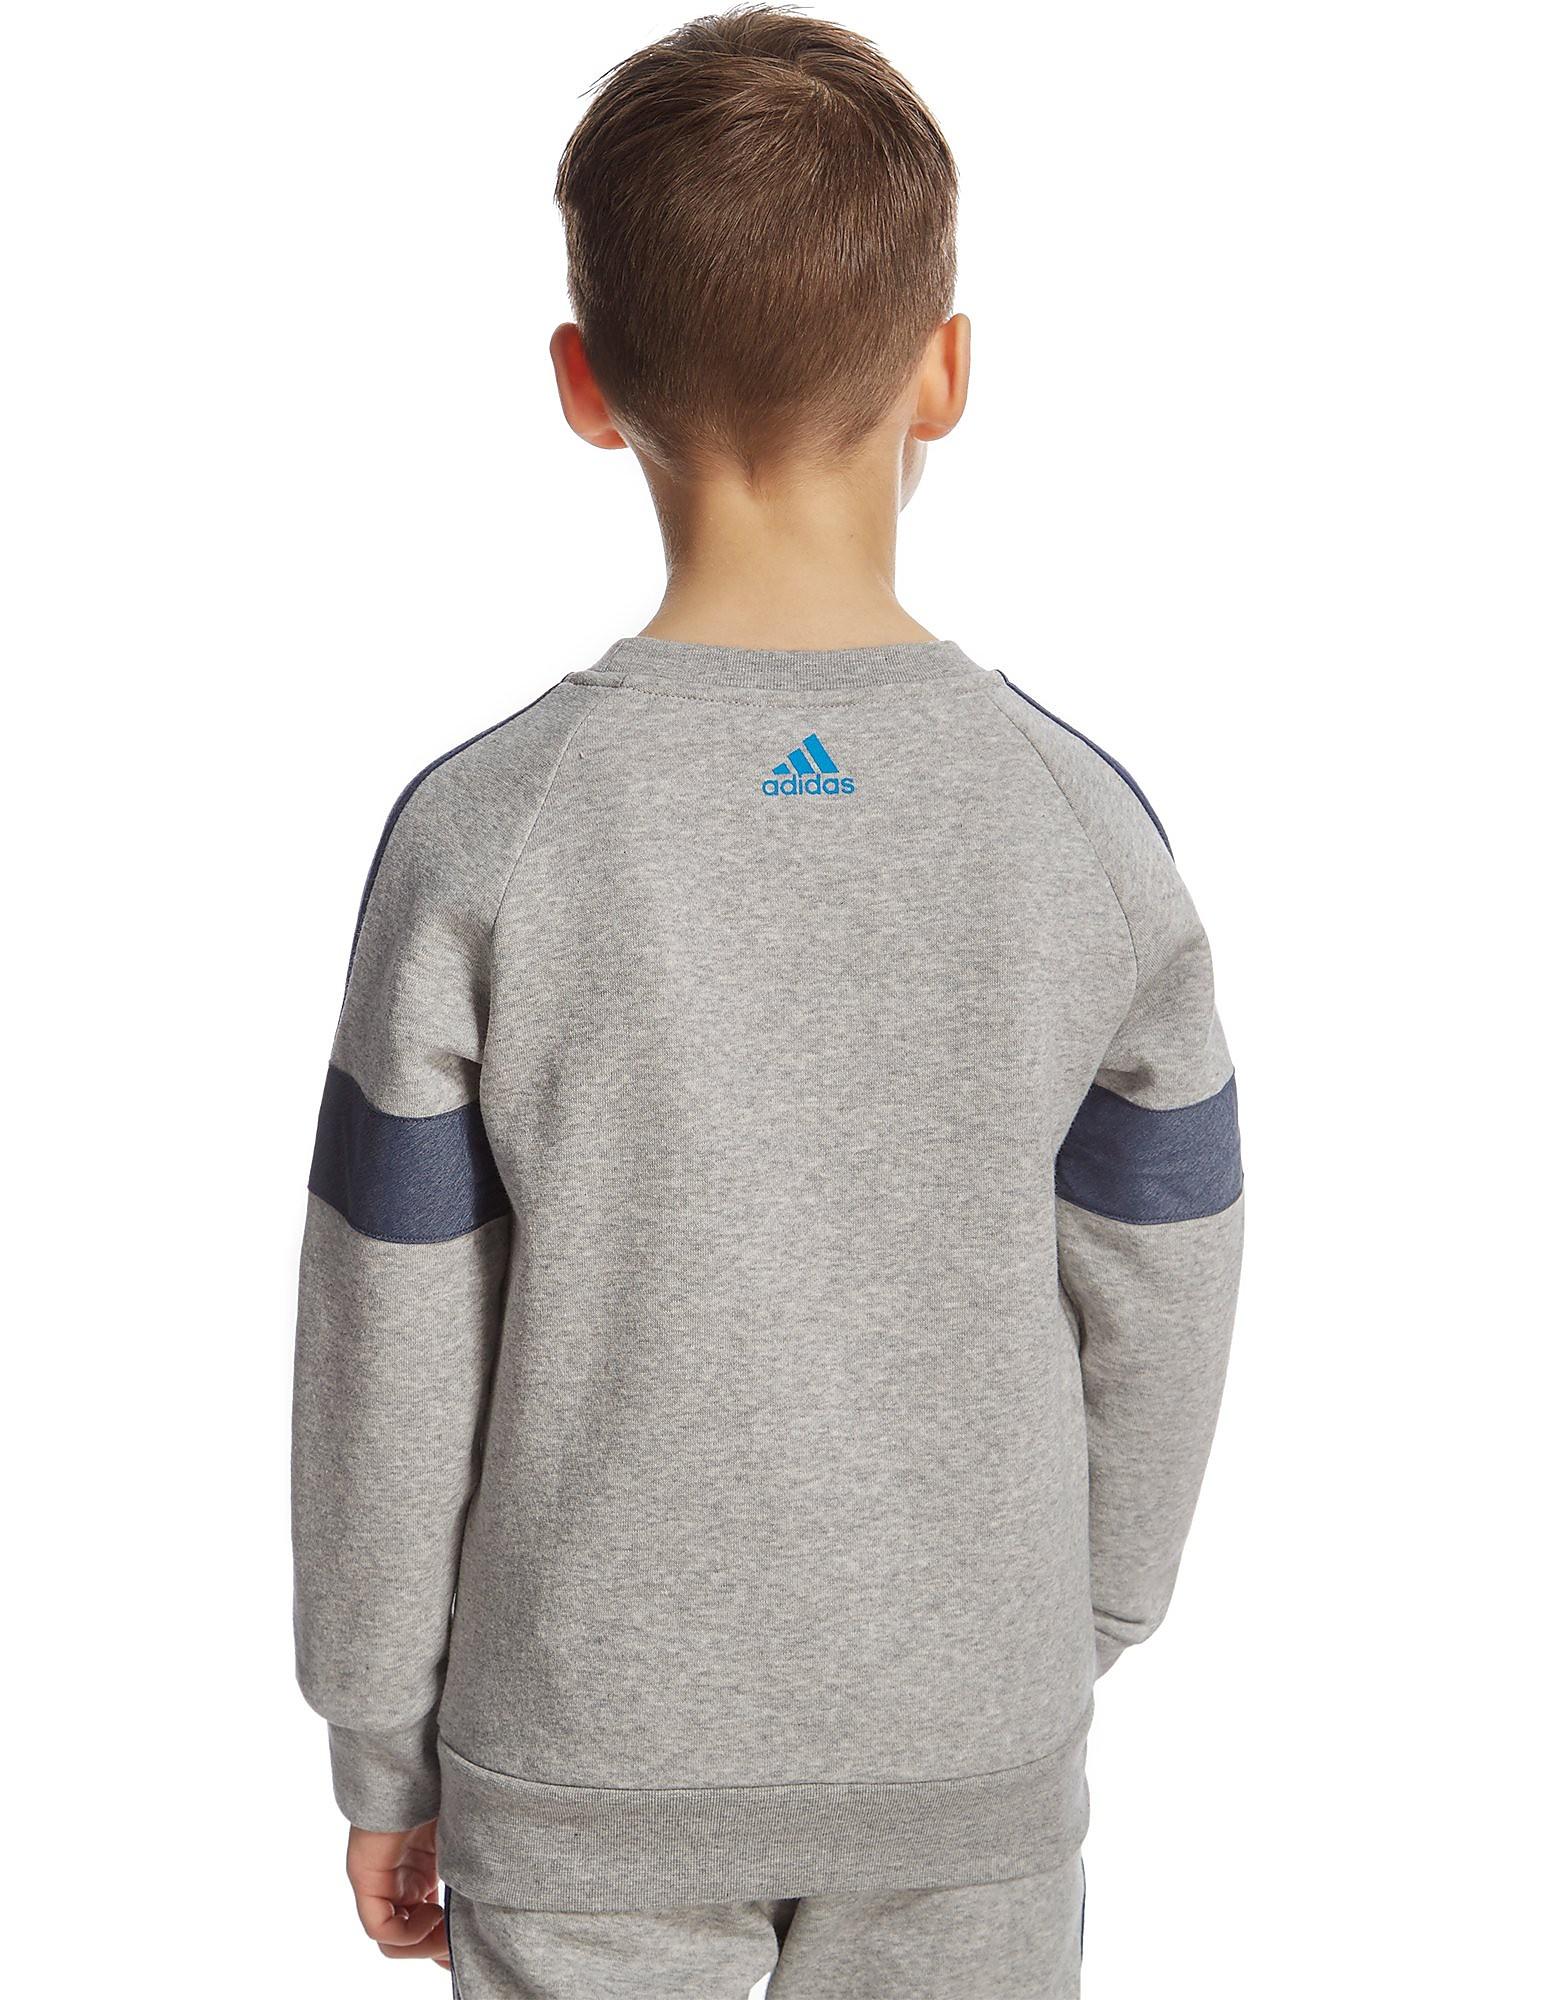 adidas Linear Crew Sweatshirt Children